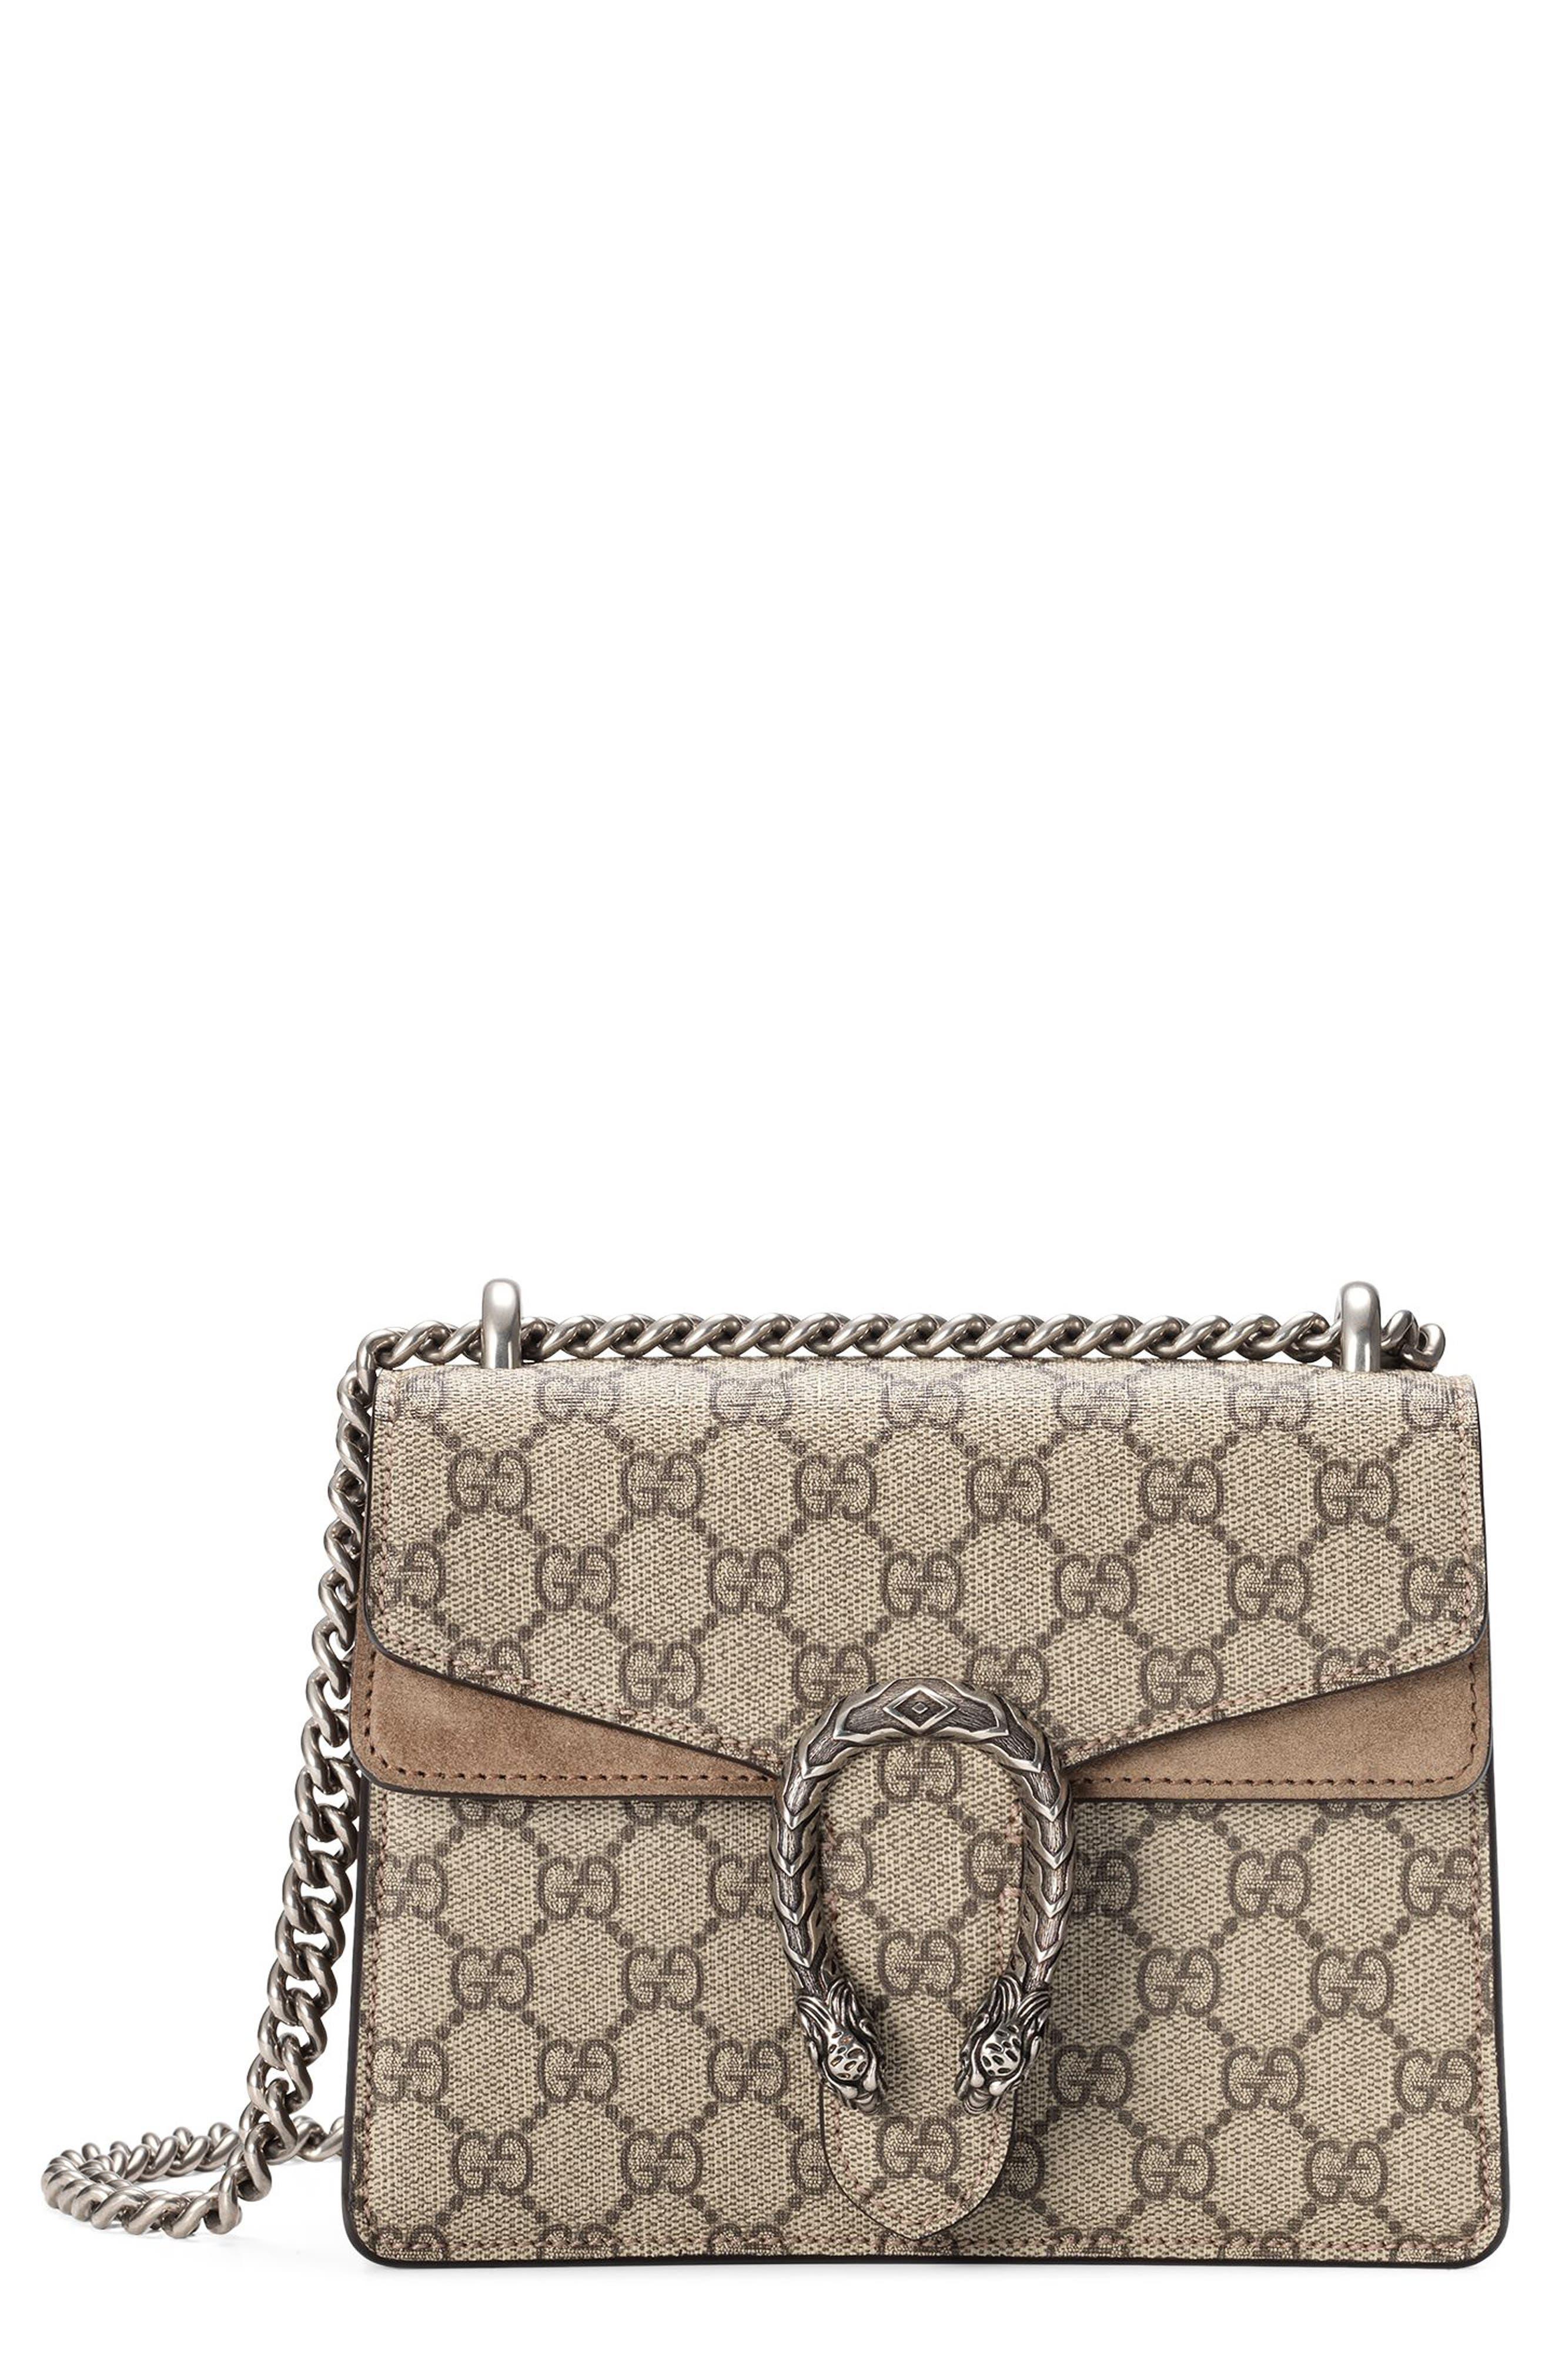 GUCCI, Mini Dionysus GG Supreme Shoulder Bag, Main thumbnail 1, color, BEIGE EBONY/ TAUPE